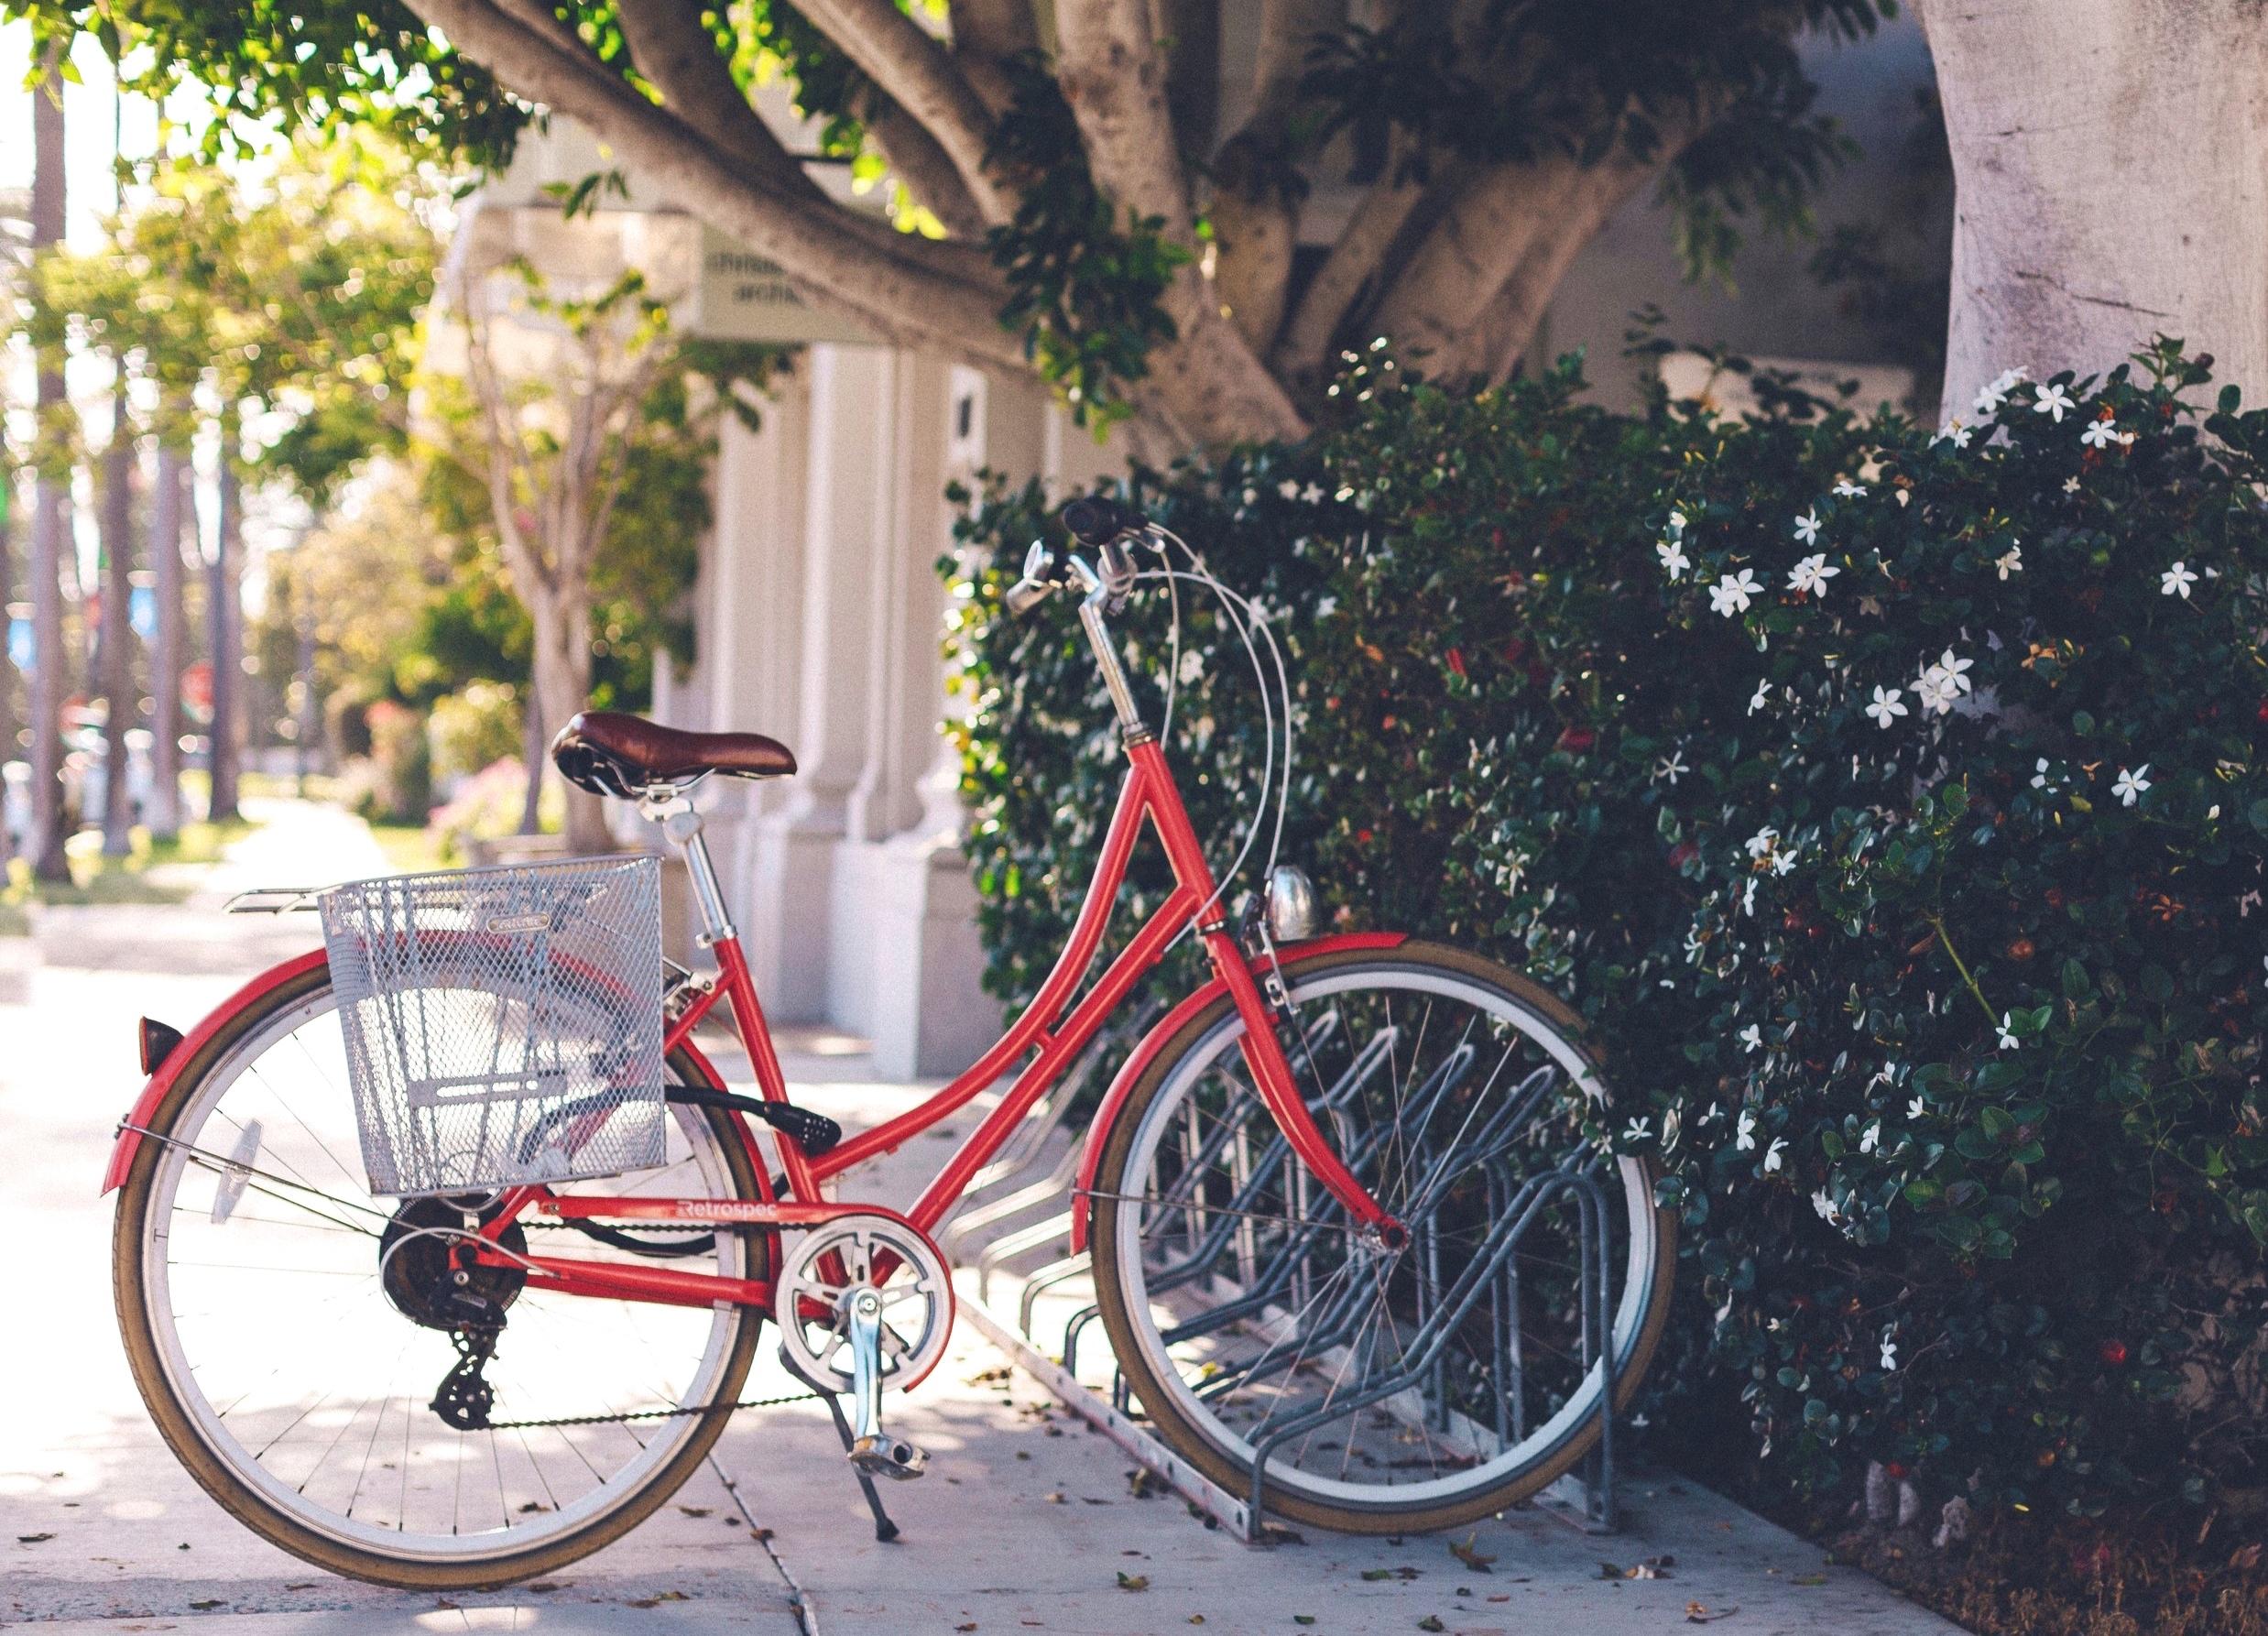 Cali Dreamin' Electric Bike Tour - La Jolla and Pacific Beach